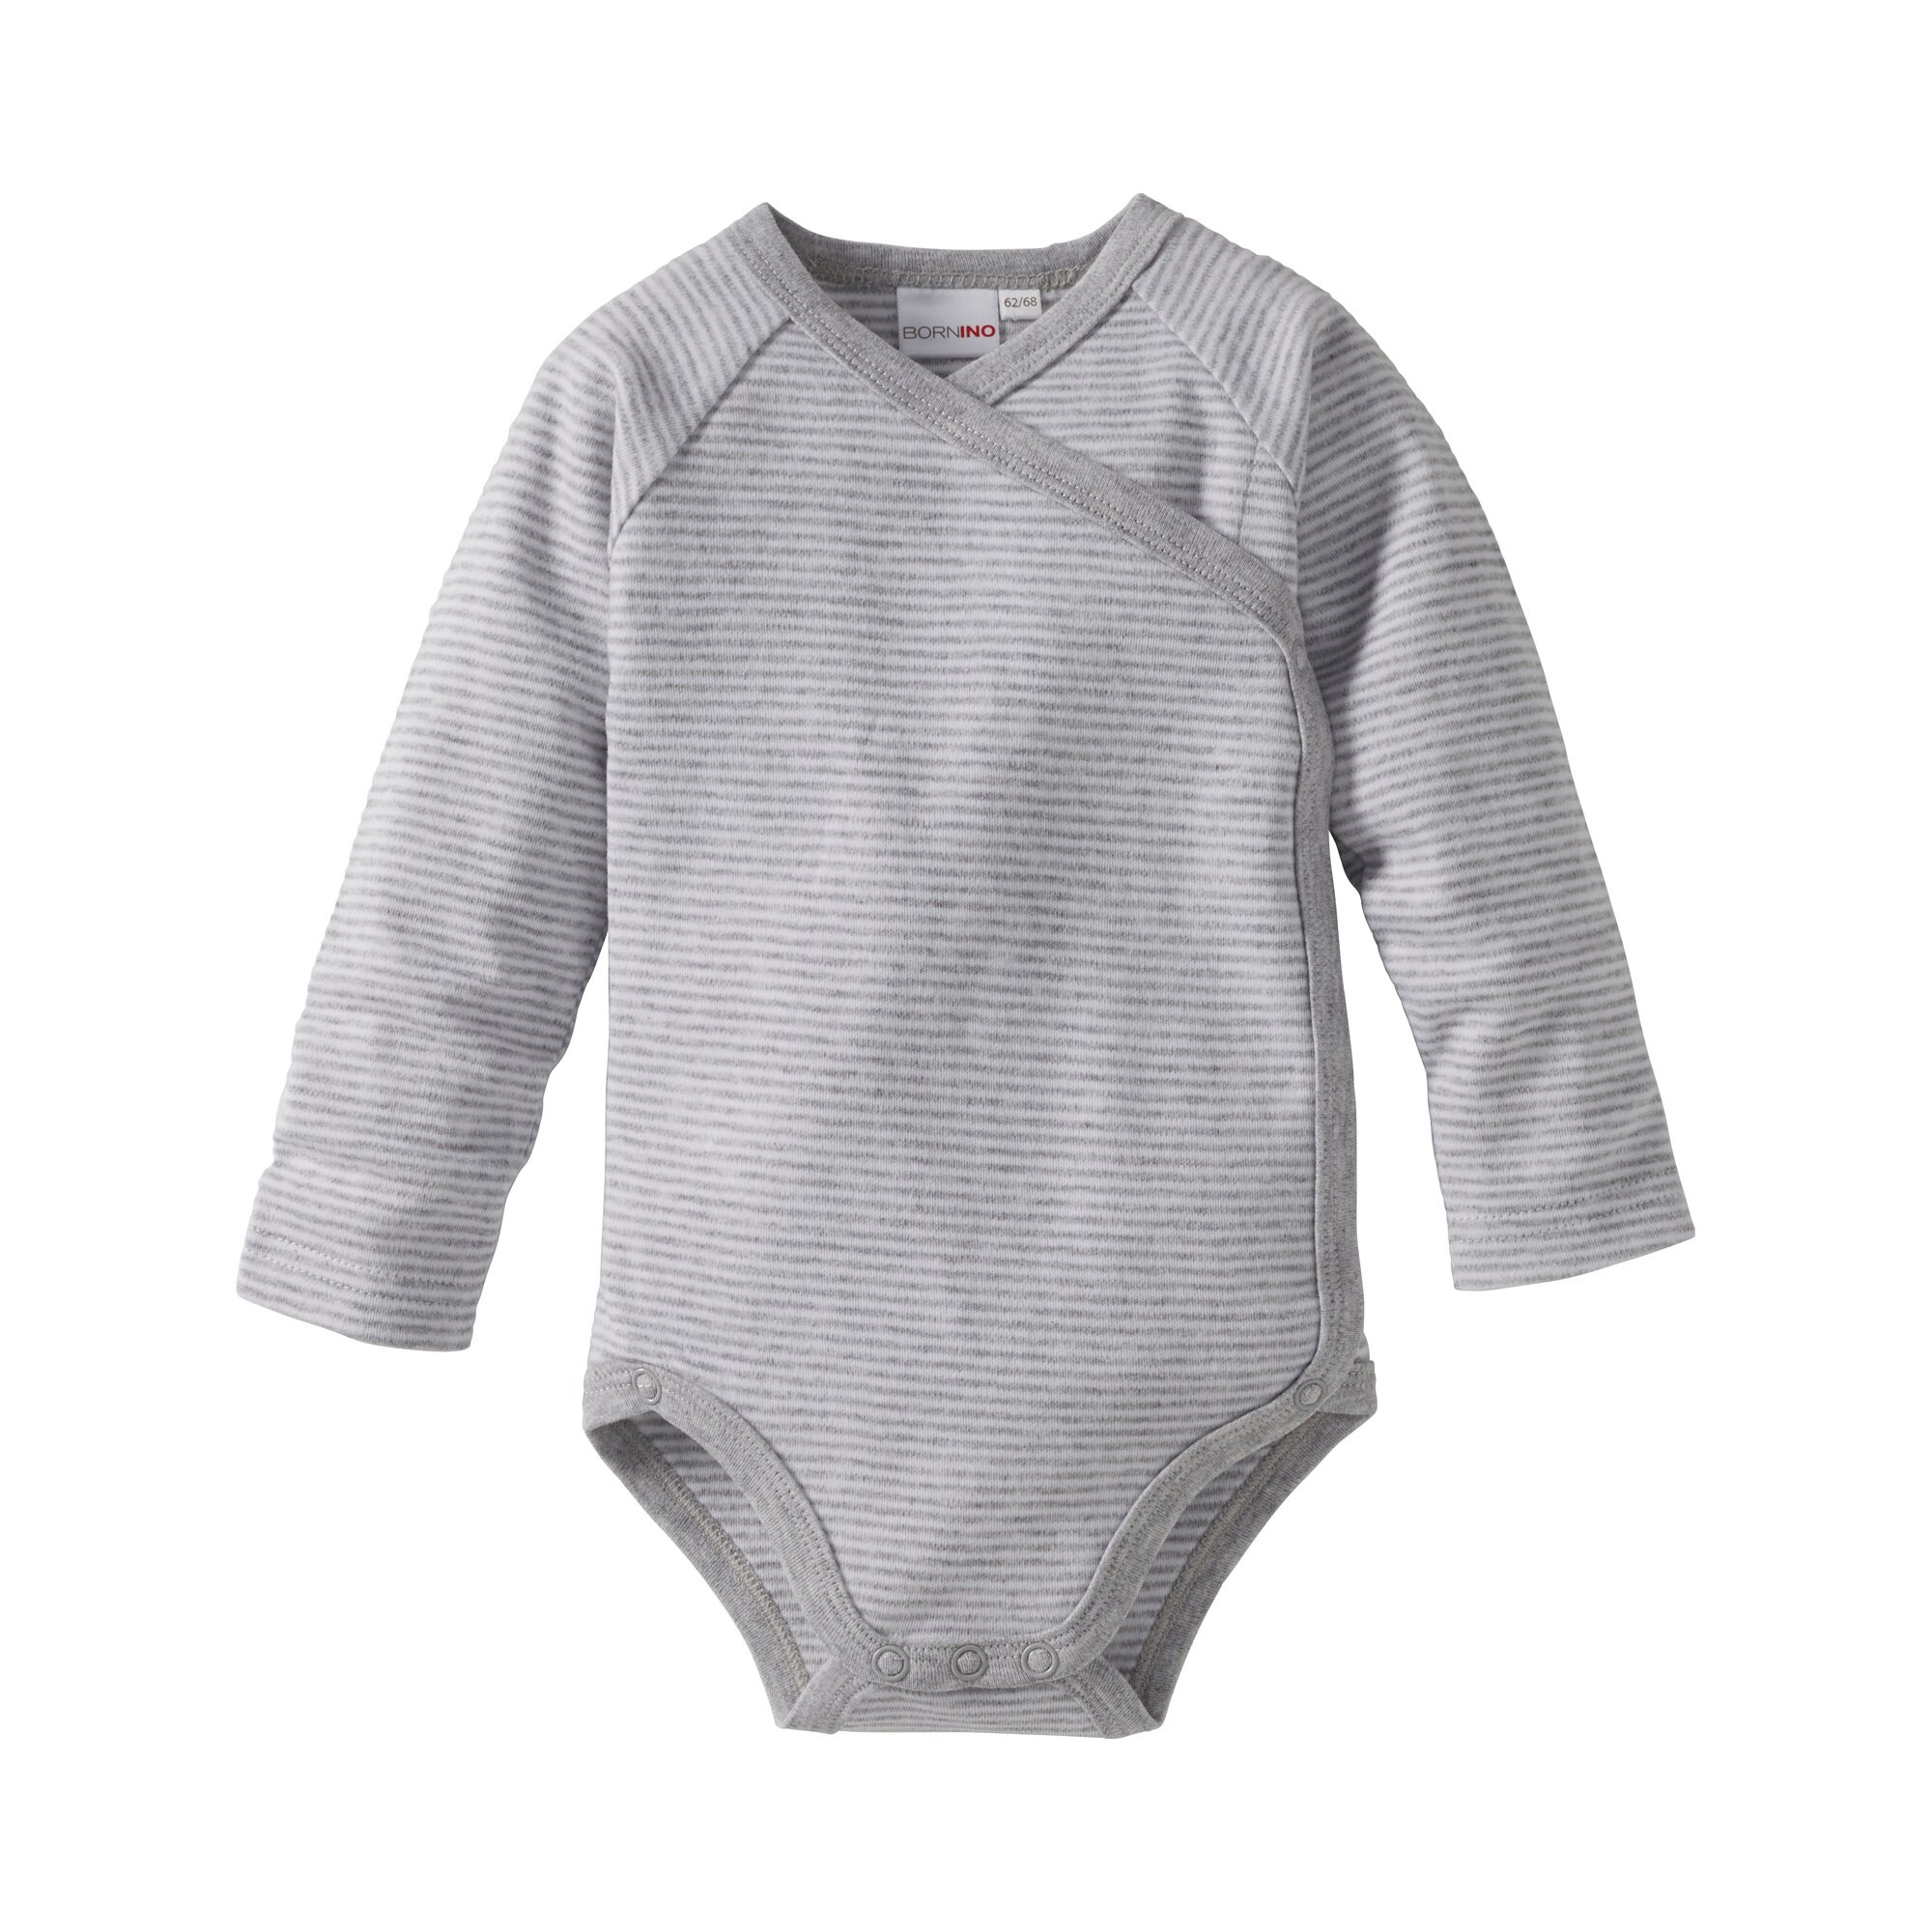 basics-baby-wickelbody-langarm-3er-pack-grau-50-62-74